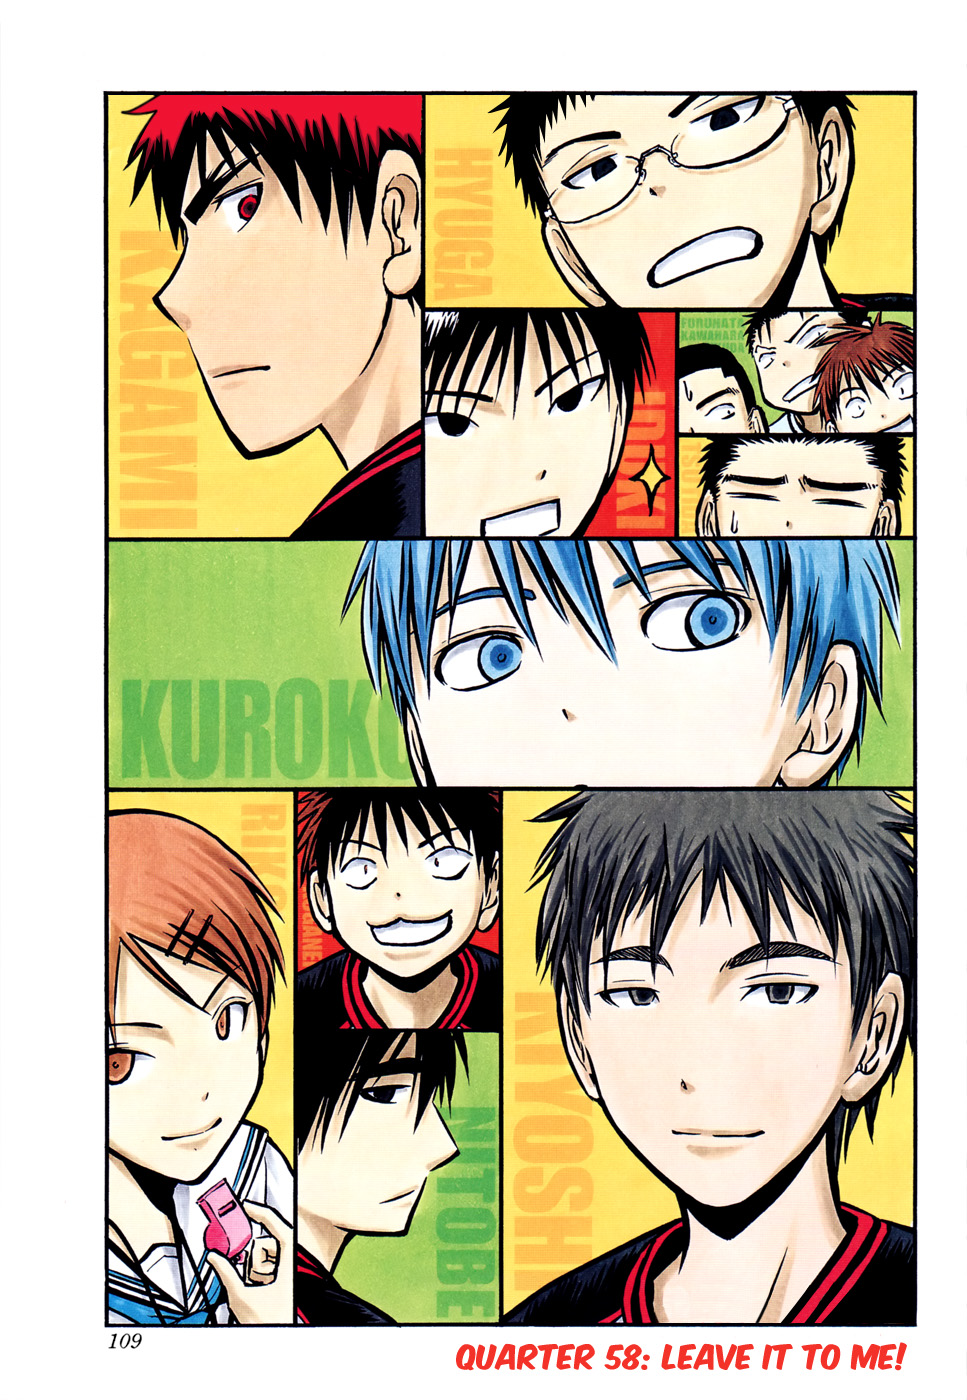 Kuroko no Basket Manga Chapter 58 - Image 600/1